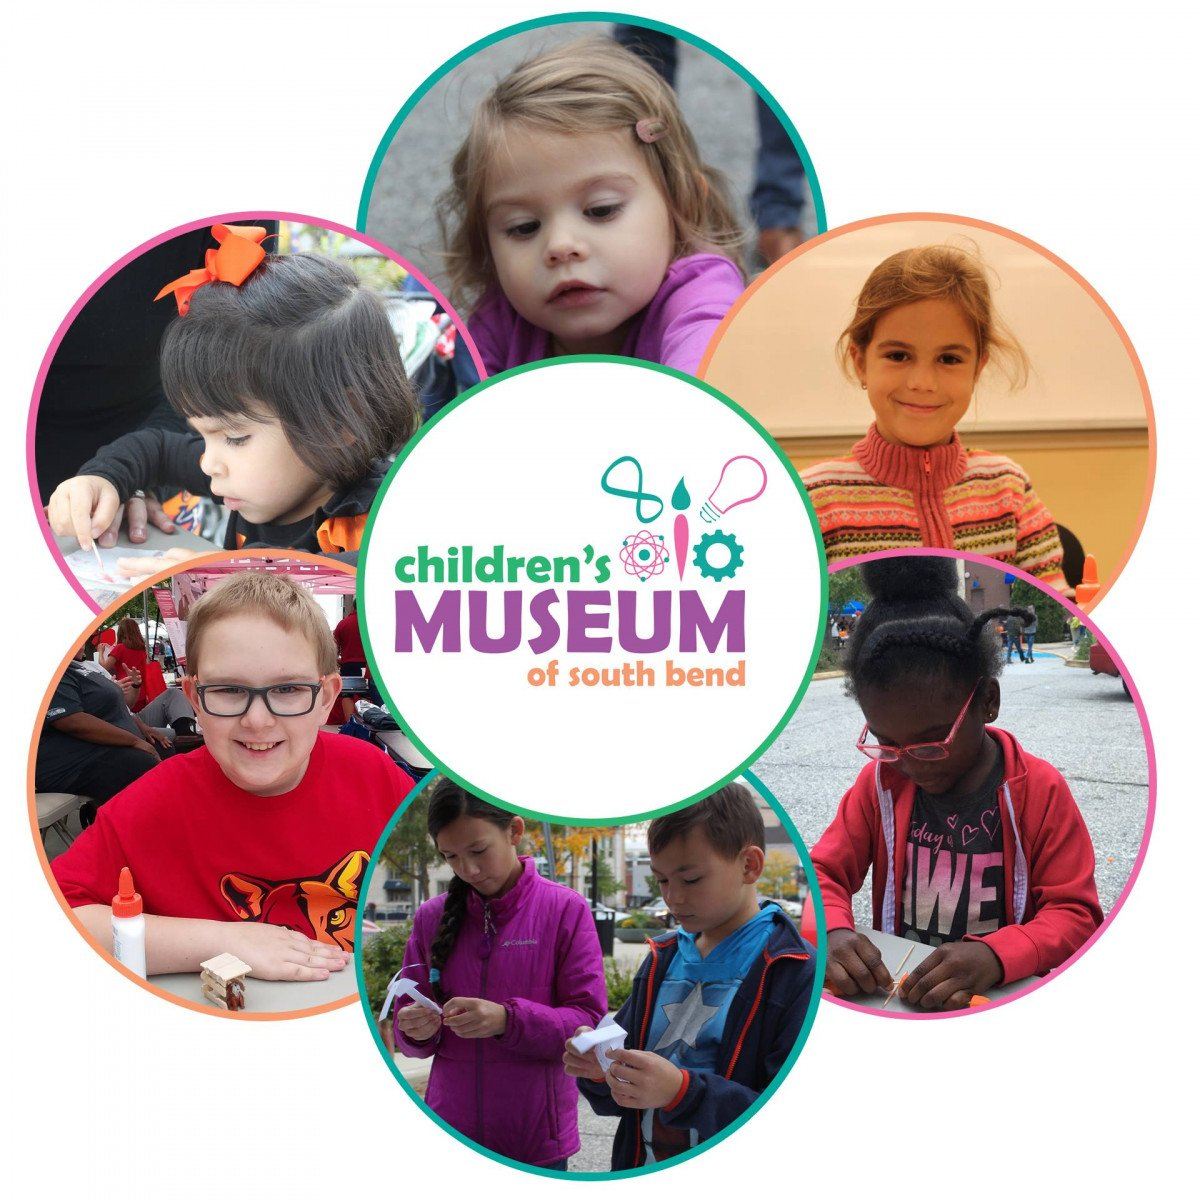 Children's Museum of South Bend Progress Update